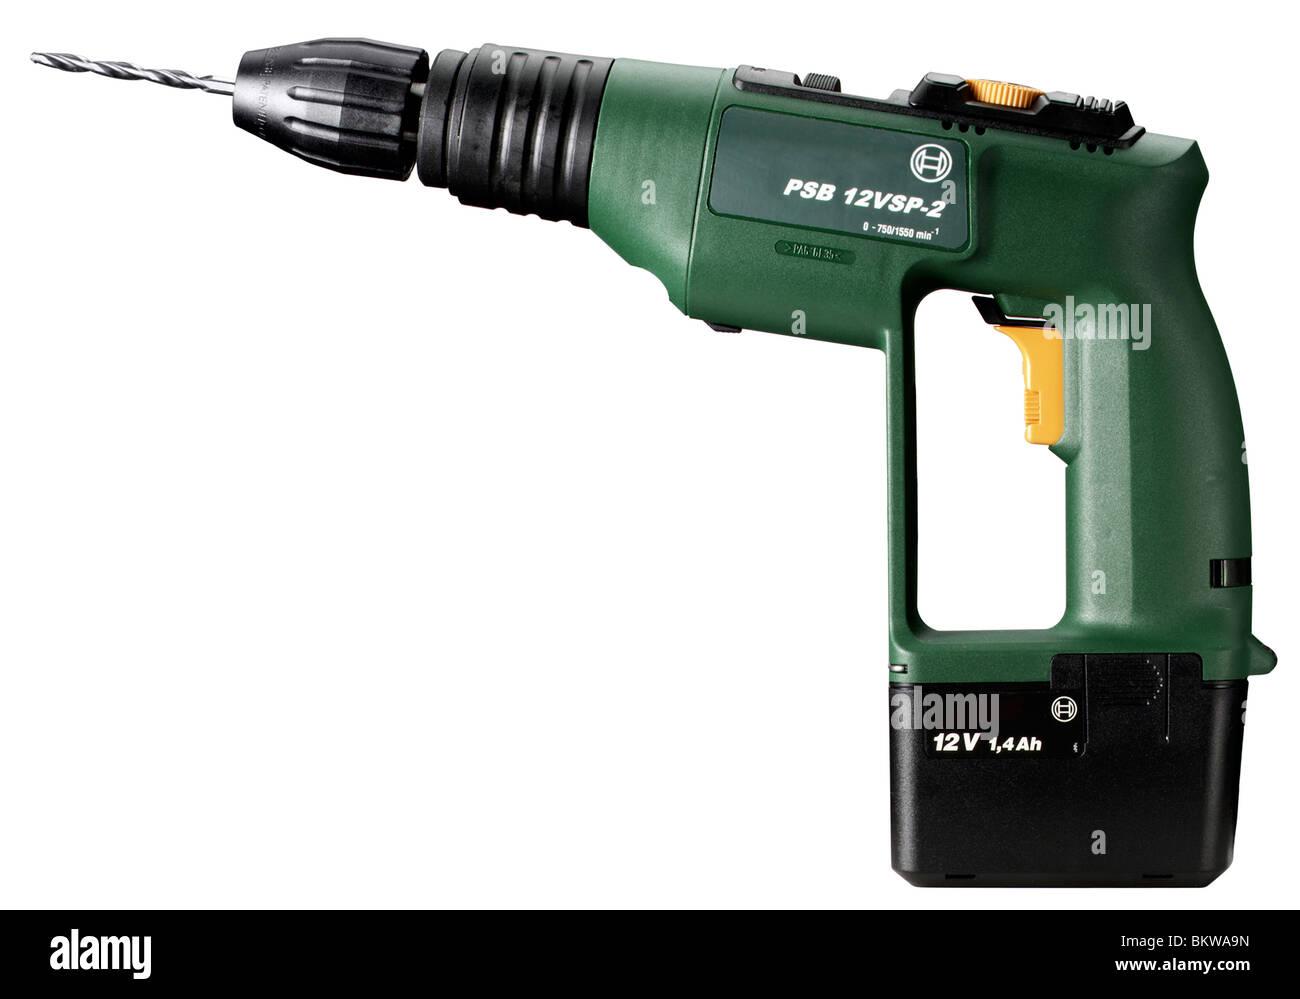 Cordless drill - Stock Image